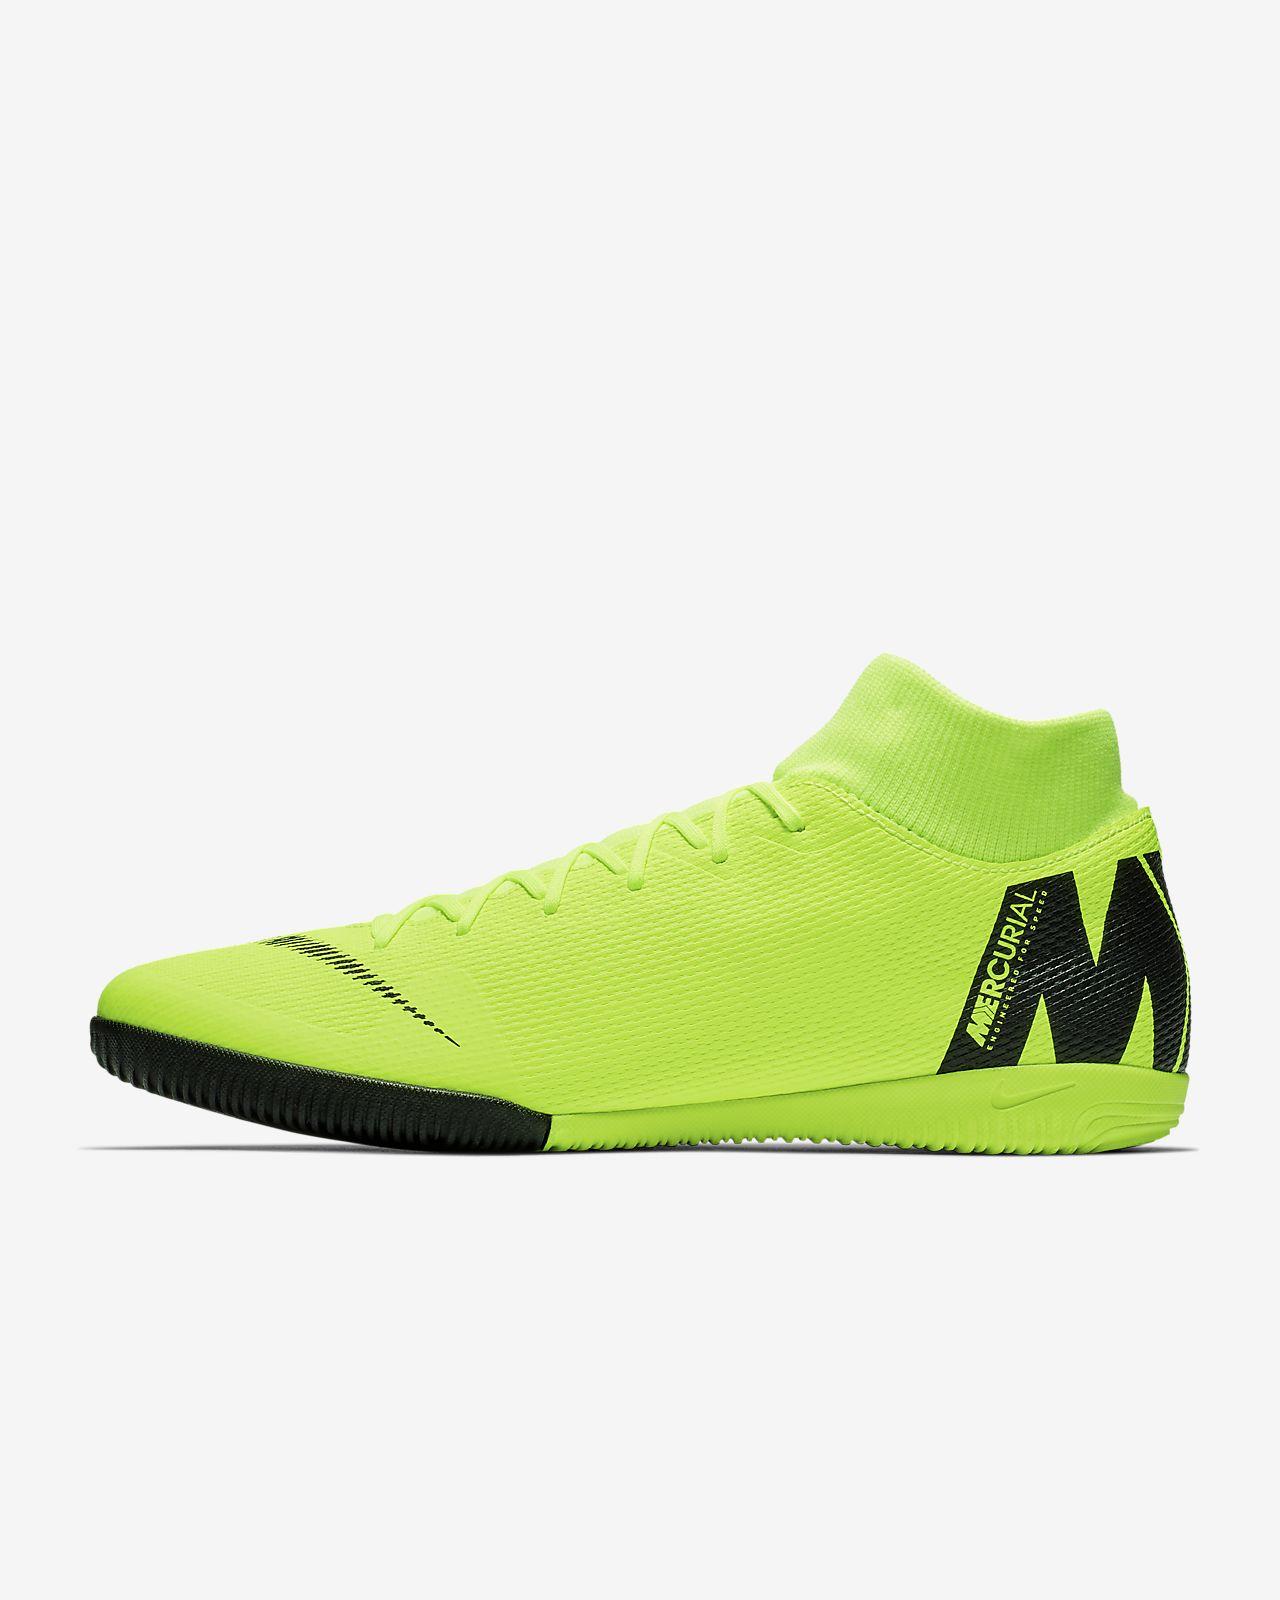 Salle De Academy Nike Vi Superfly Mercurialx Football En Chaussure q67xwgtg